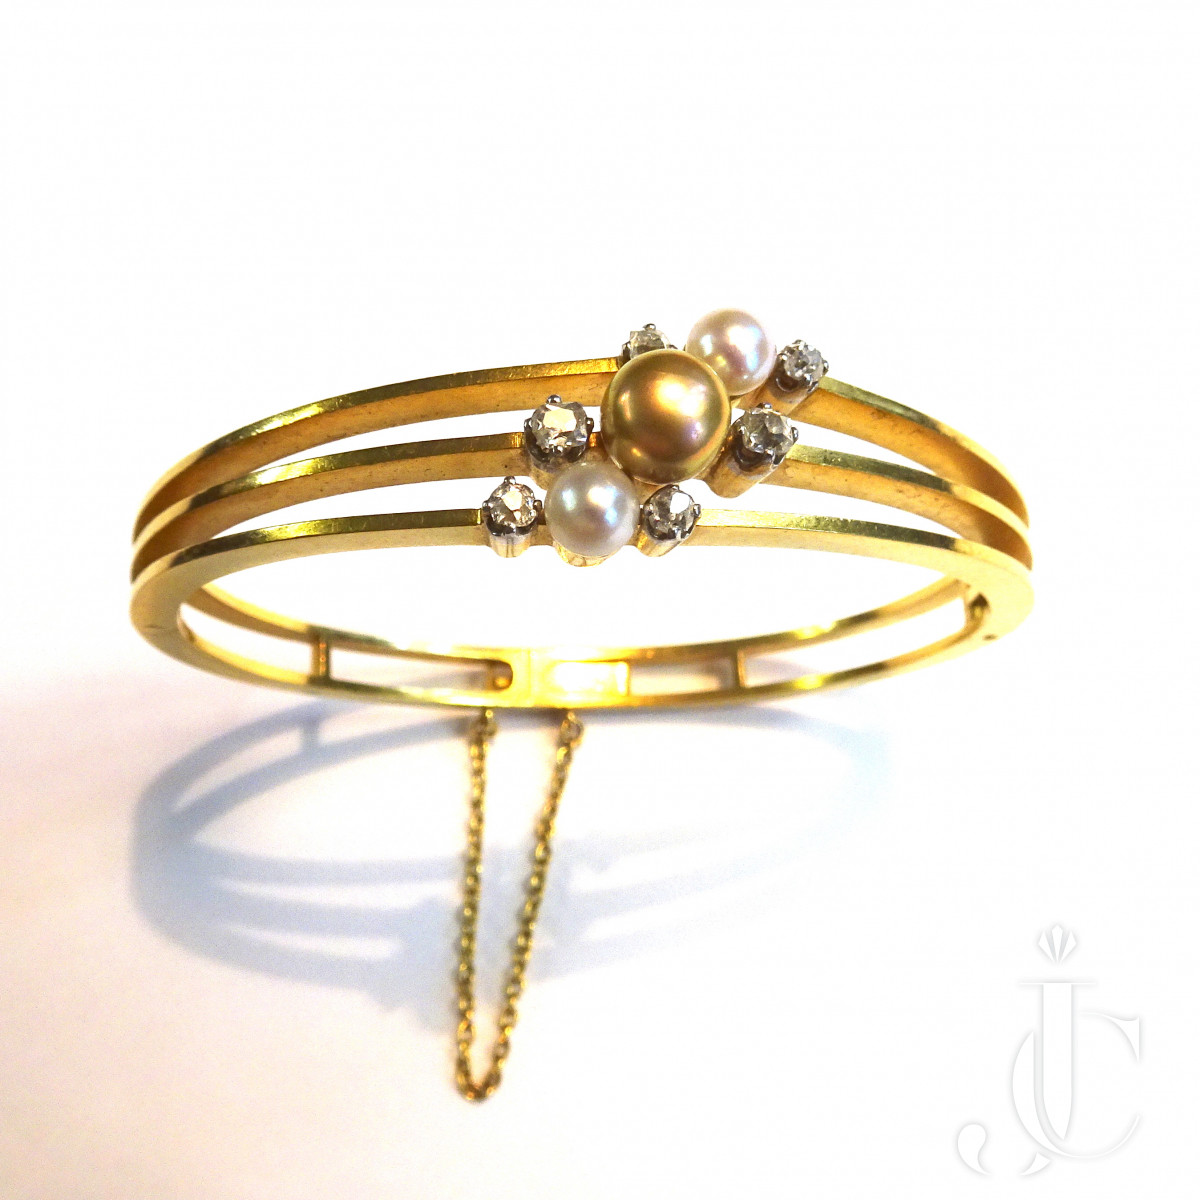 Pearl Gold Bangle by Bapst Paris